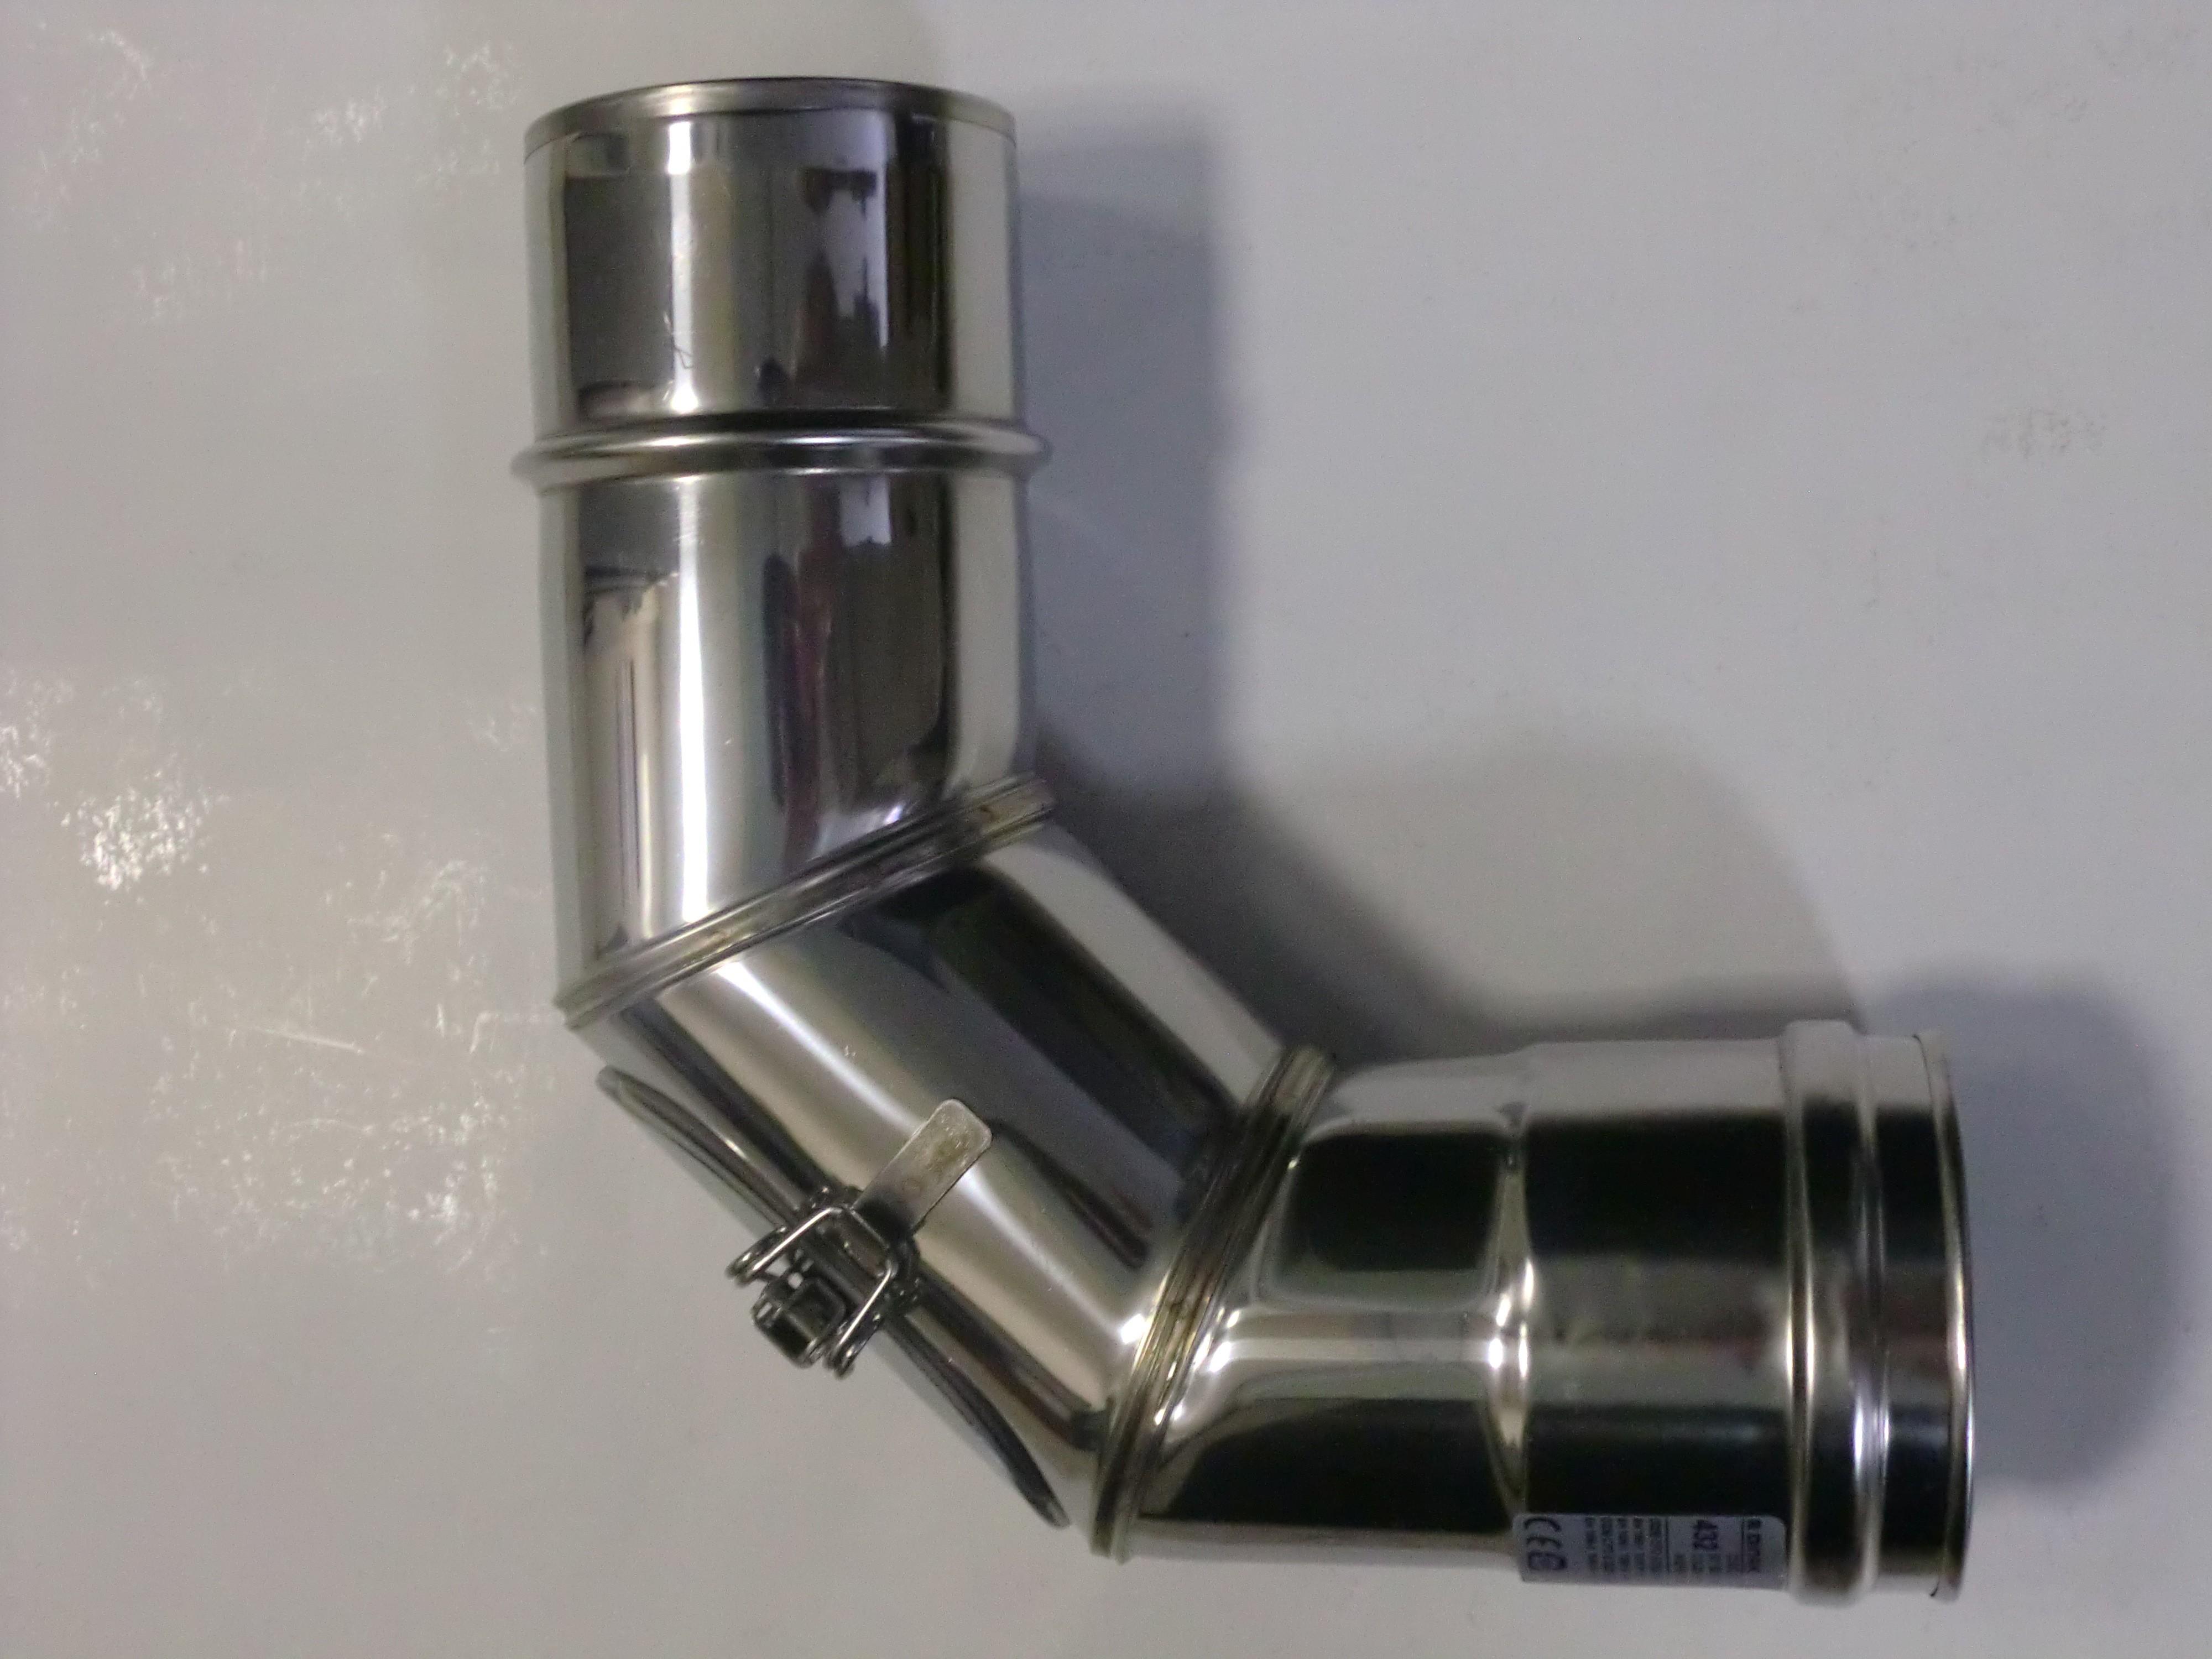 Tubos para chimeneas precios free elegant with tubos de - Tubos de acero inoxidable para chimeneas ...